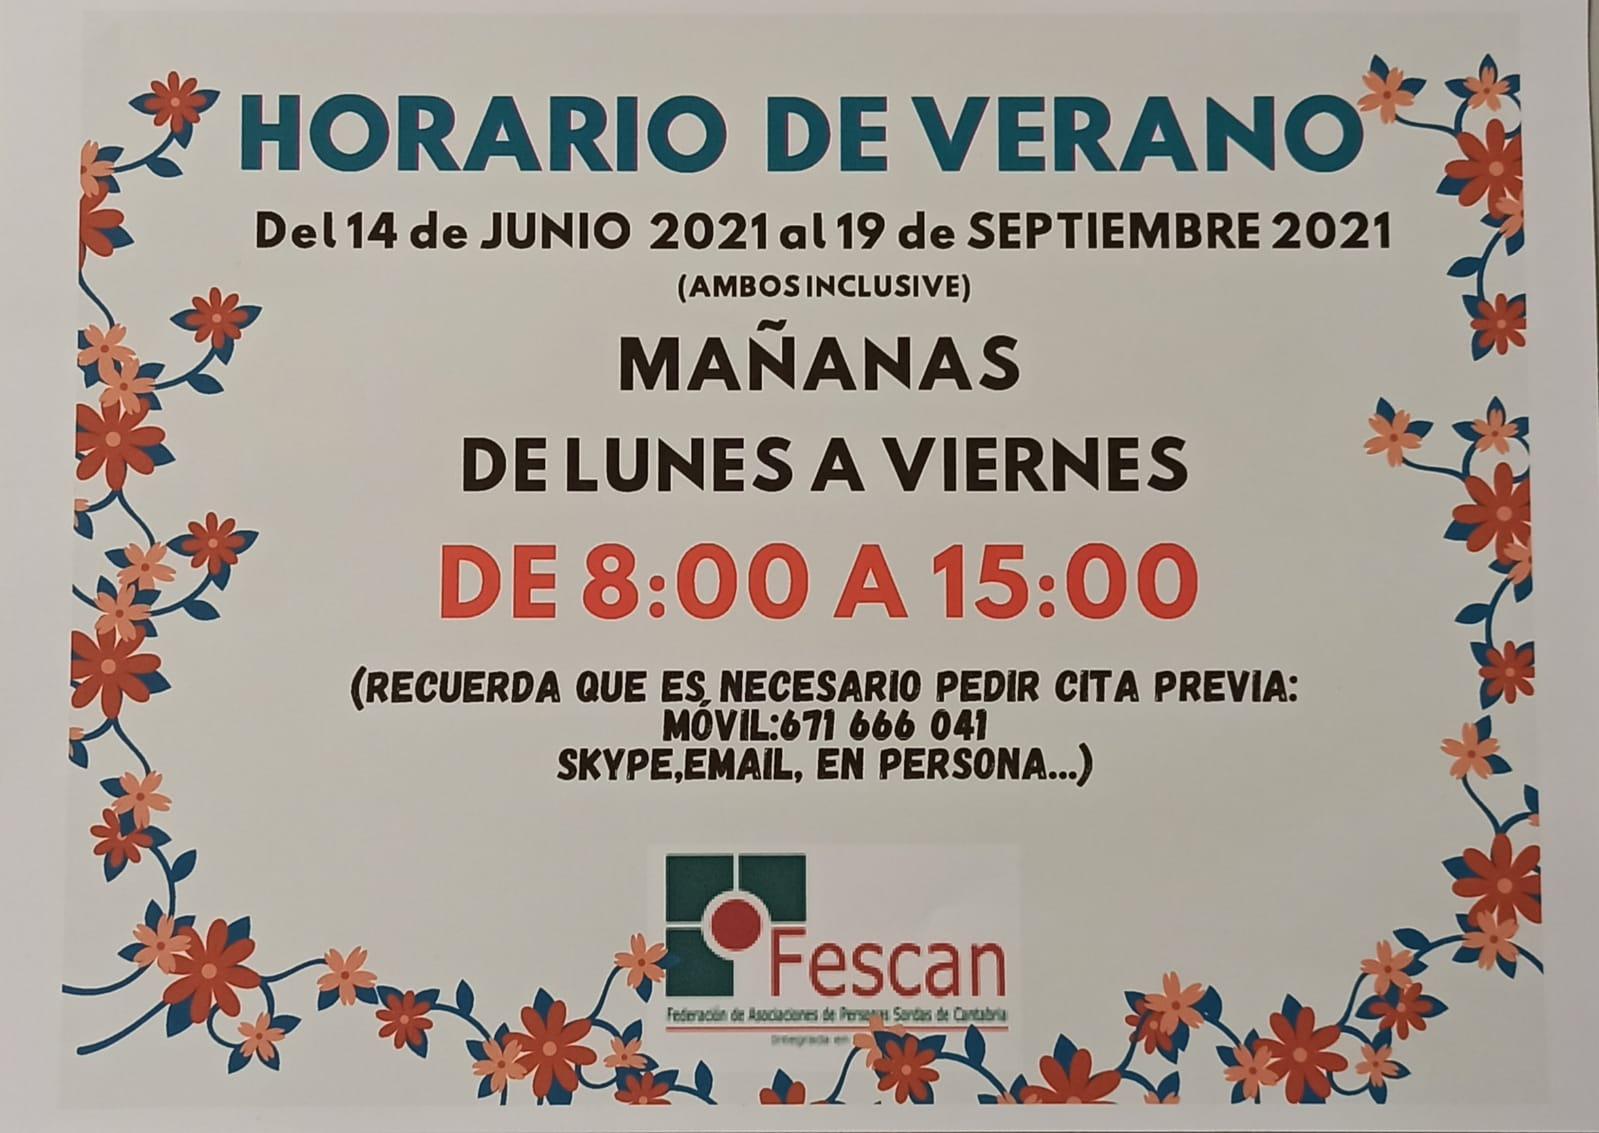 HORARIO DE VERANO DE FESCAN  2021